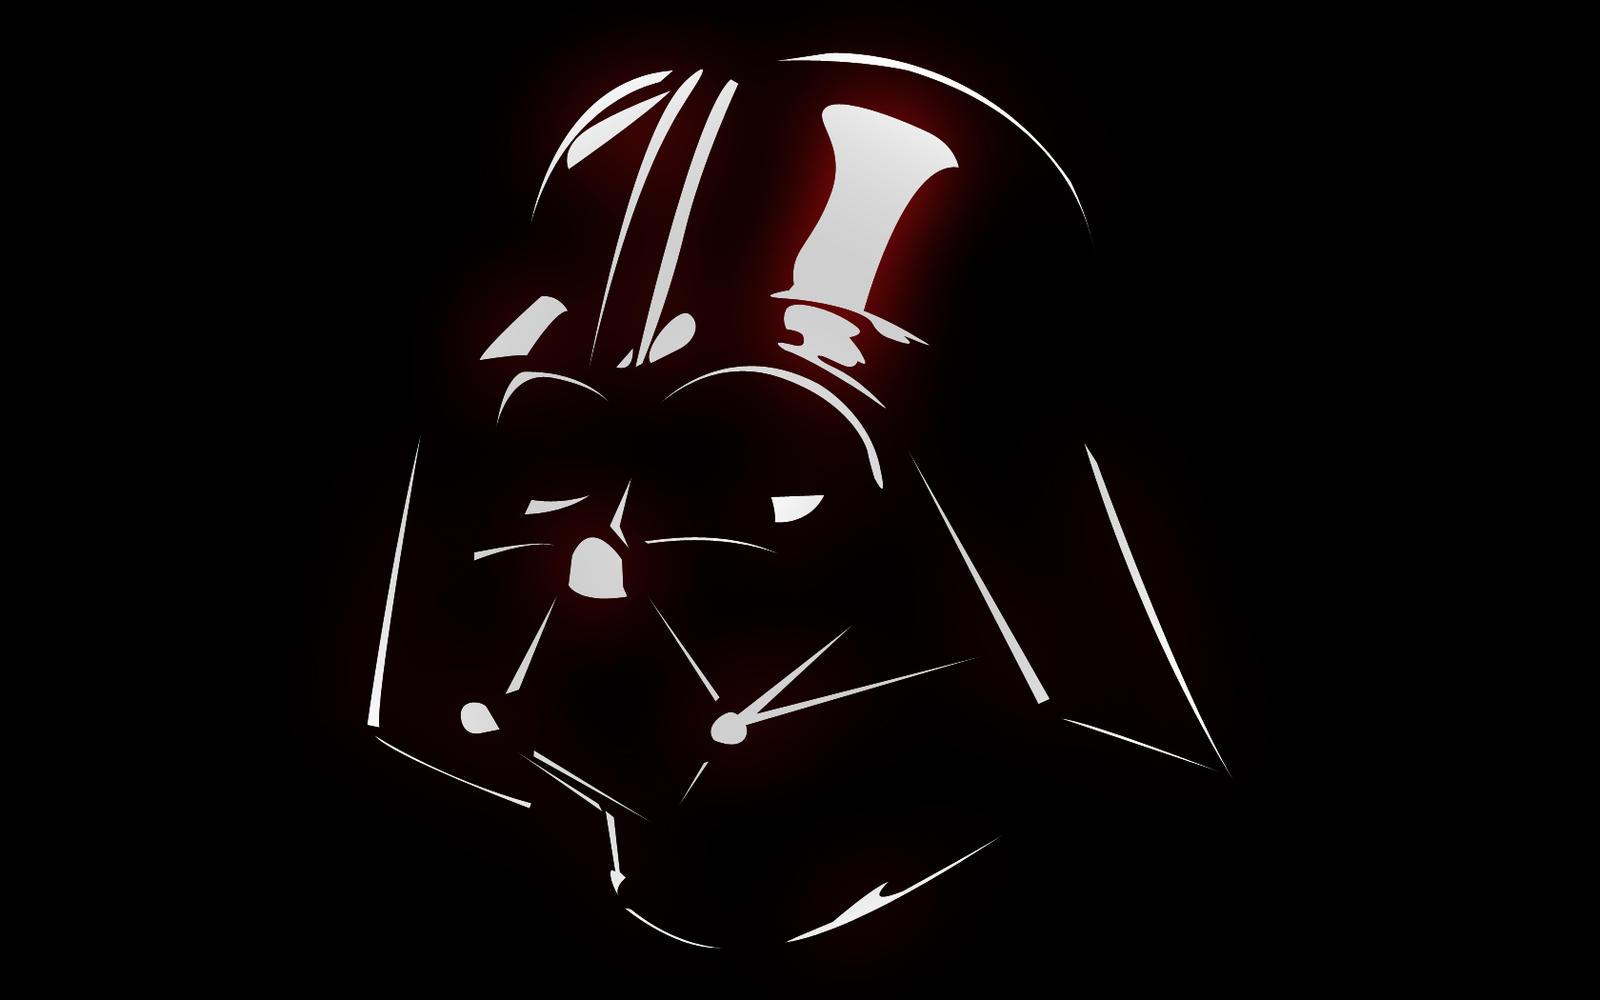 Darth Vader Silhouette Vector For - darth vader vector Darth Vader Face Vector